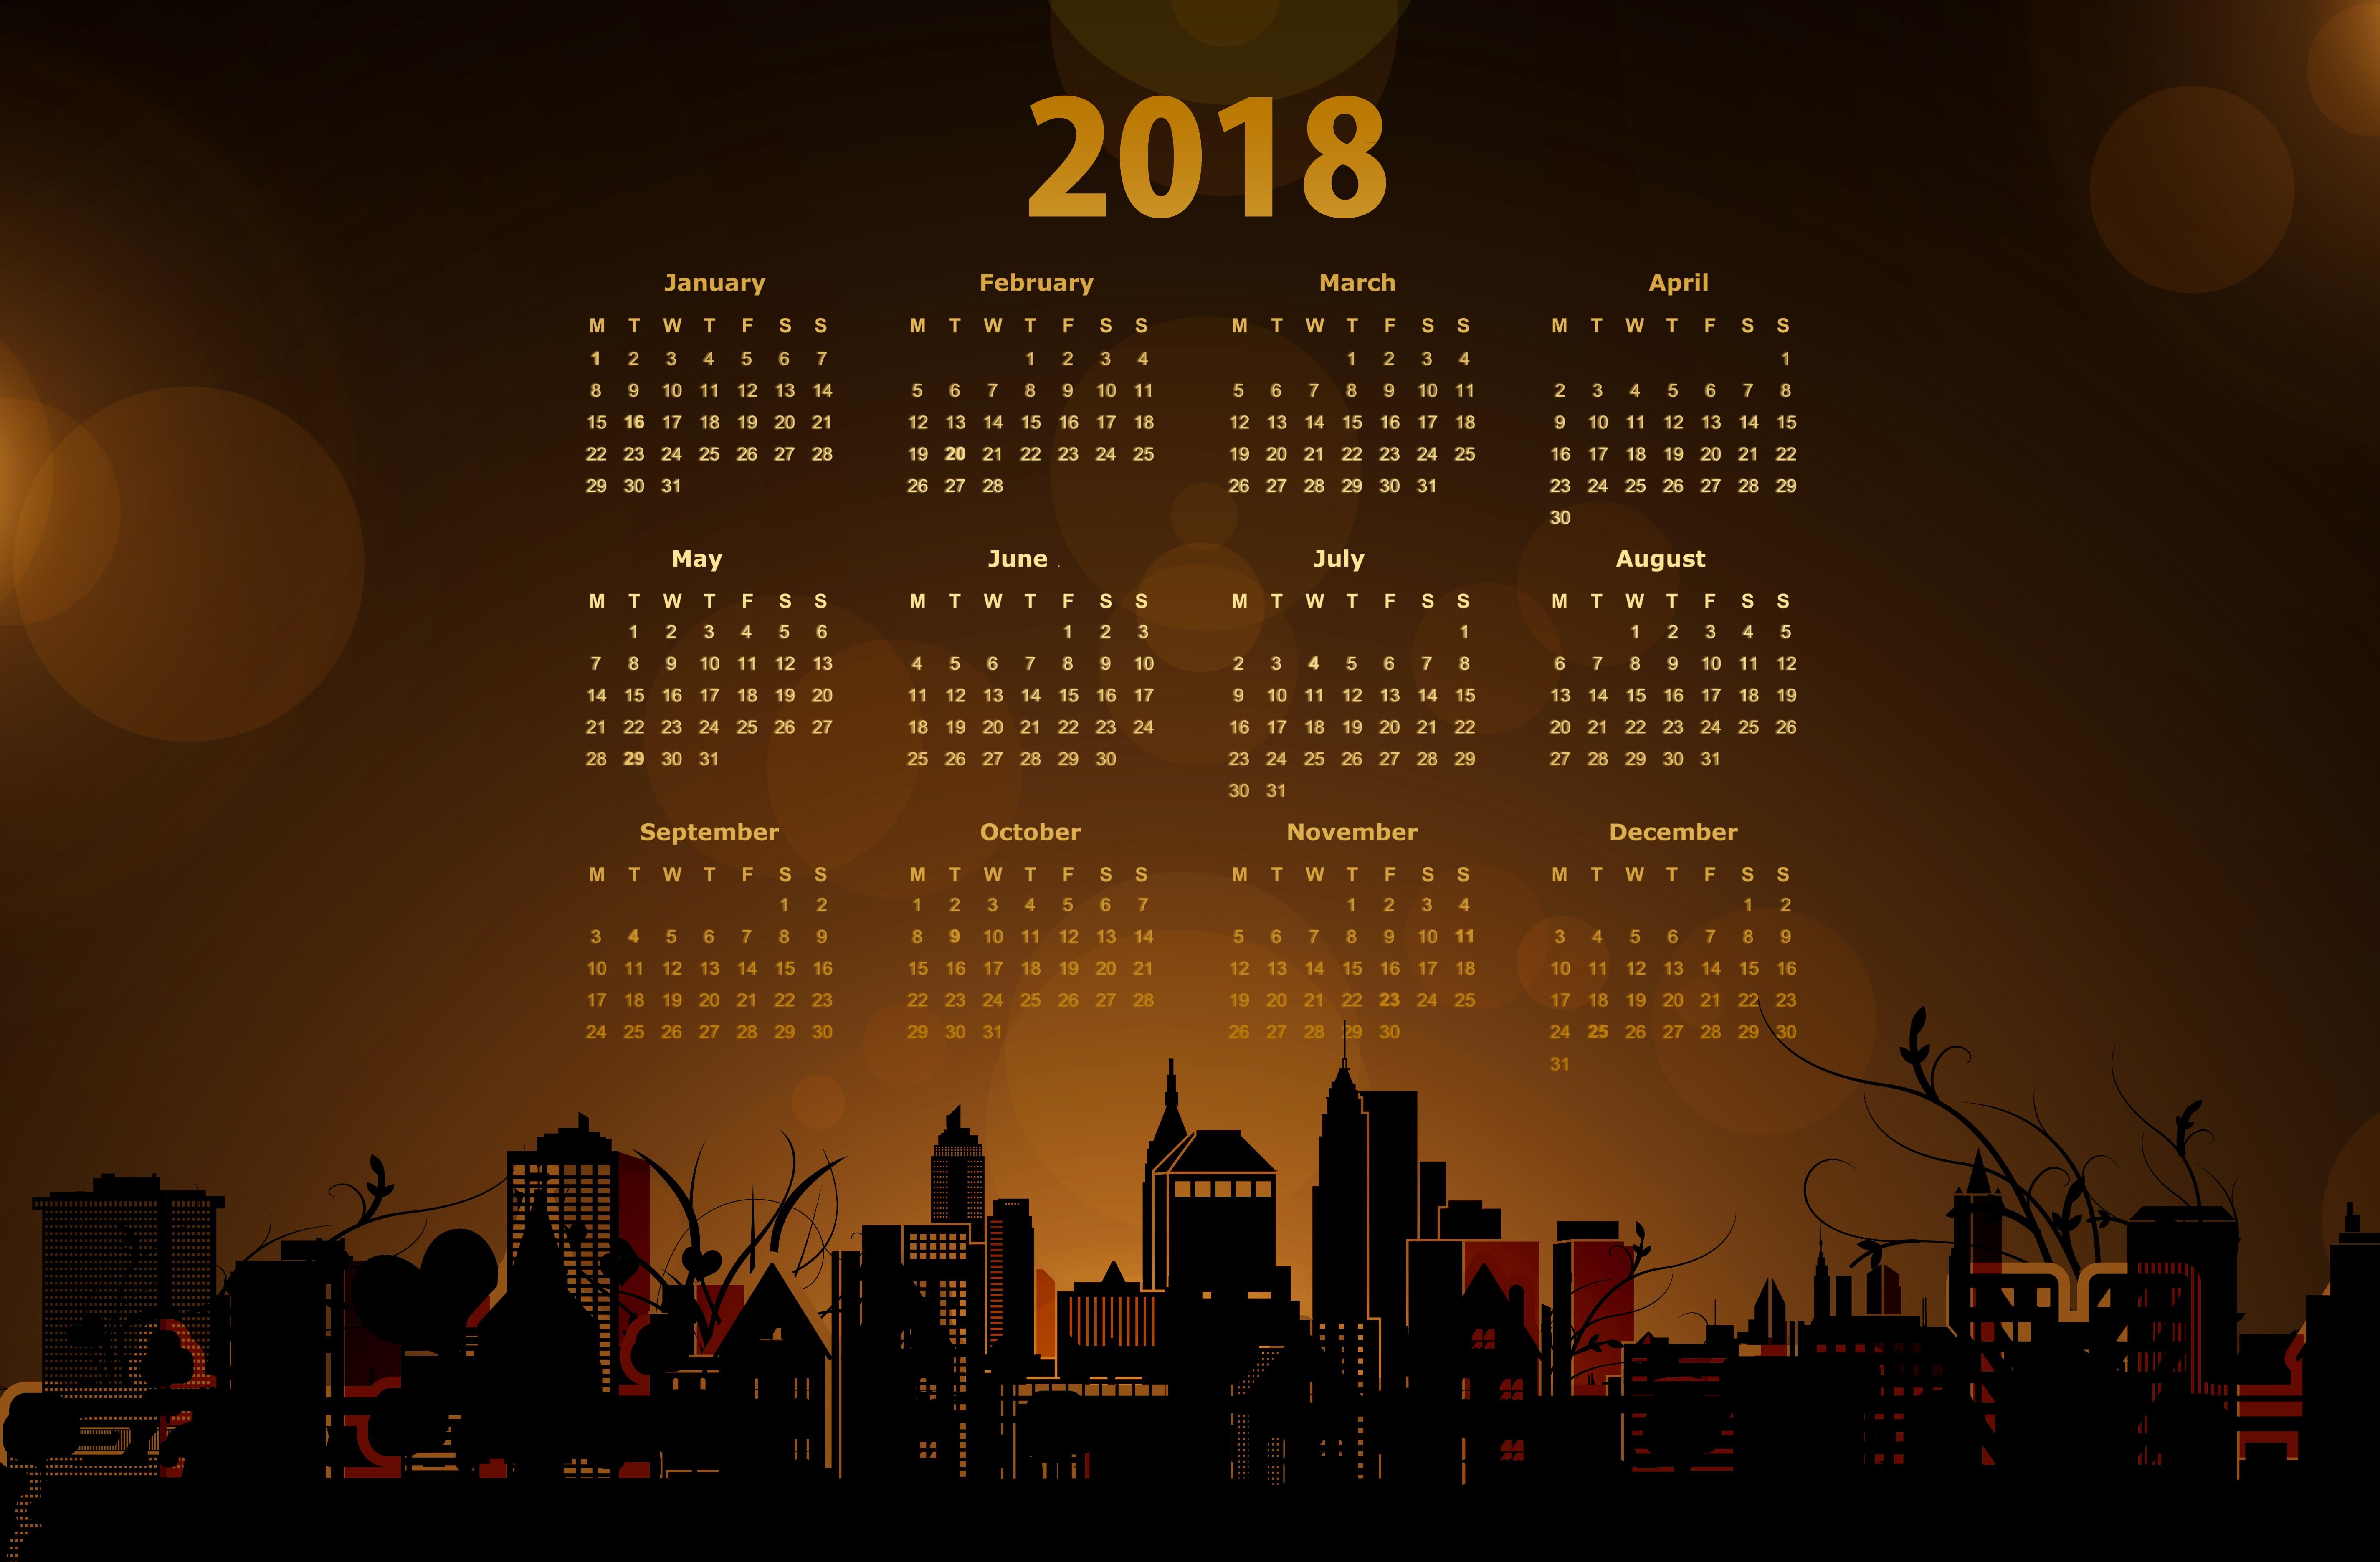 2018 Calendar With A Cityscape 5k Retina Ultra Fondo De